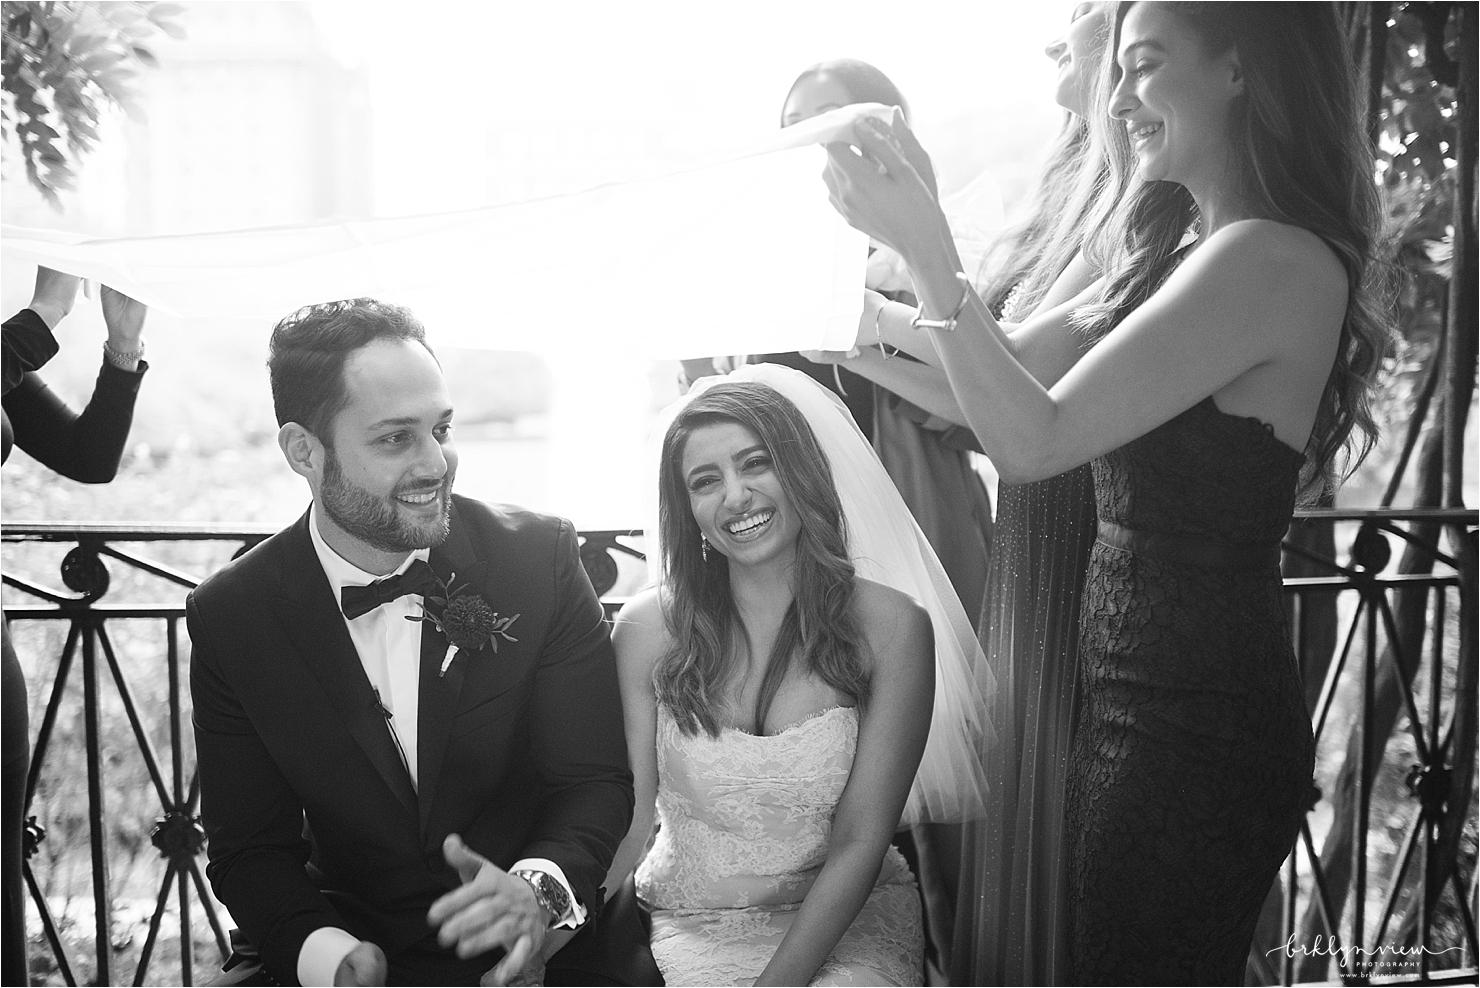 Persian Wedding Outdoor Ceremony